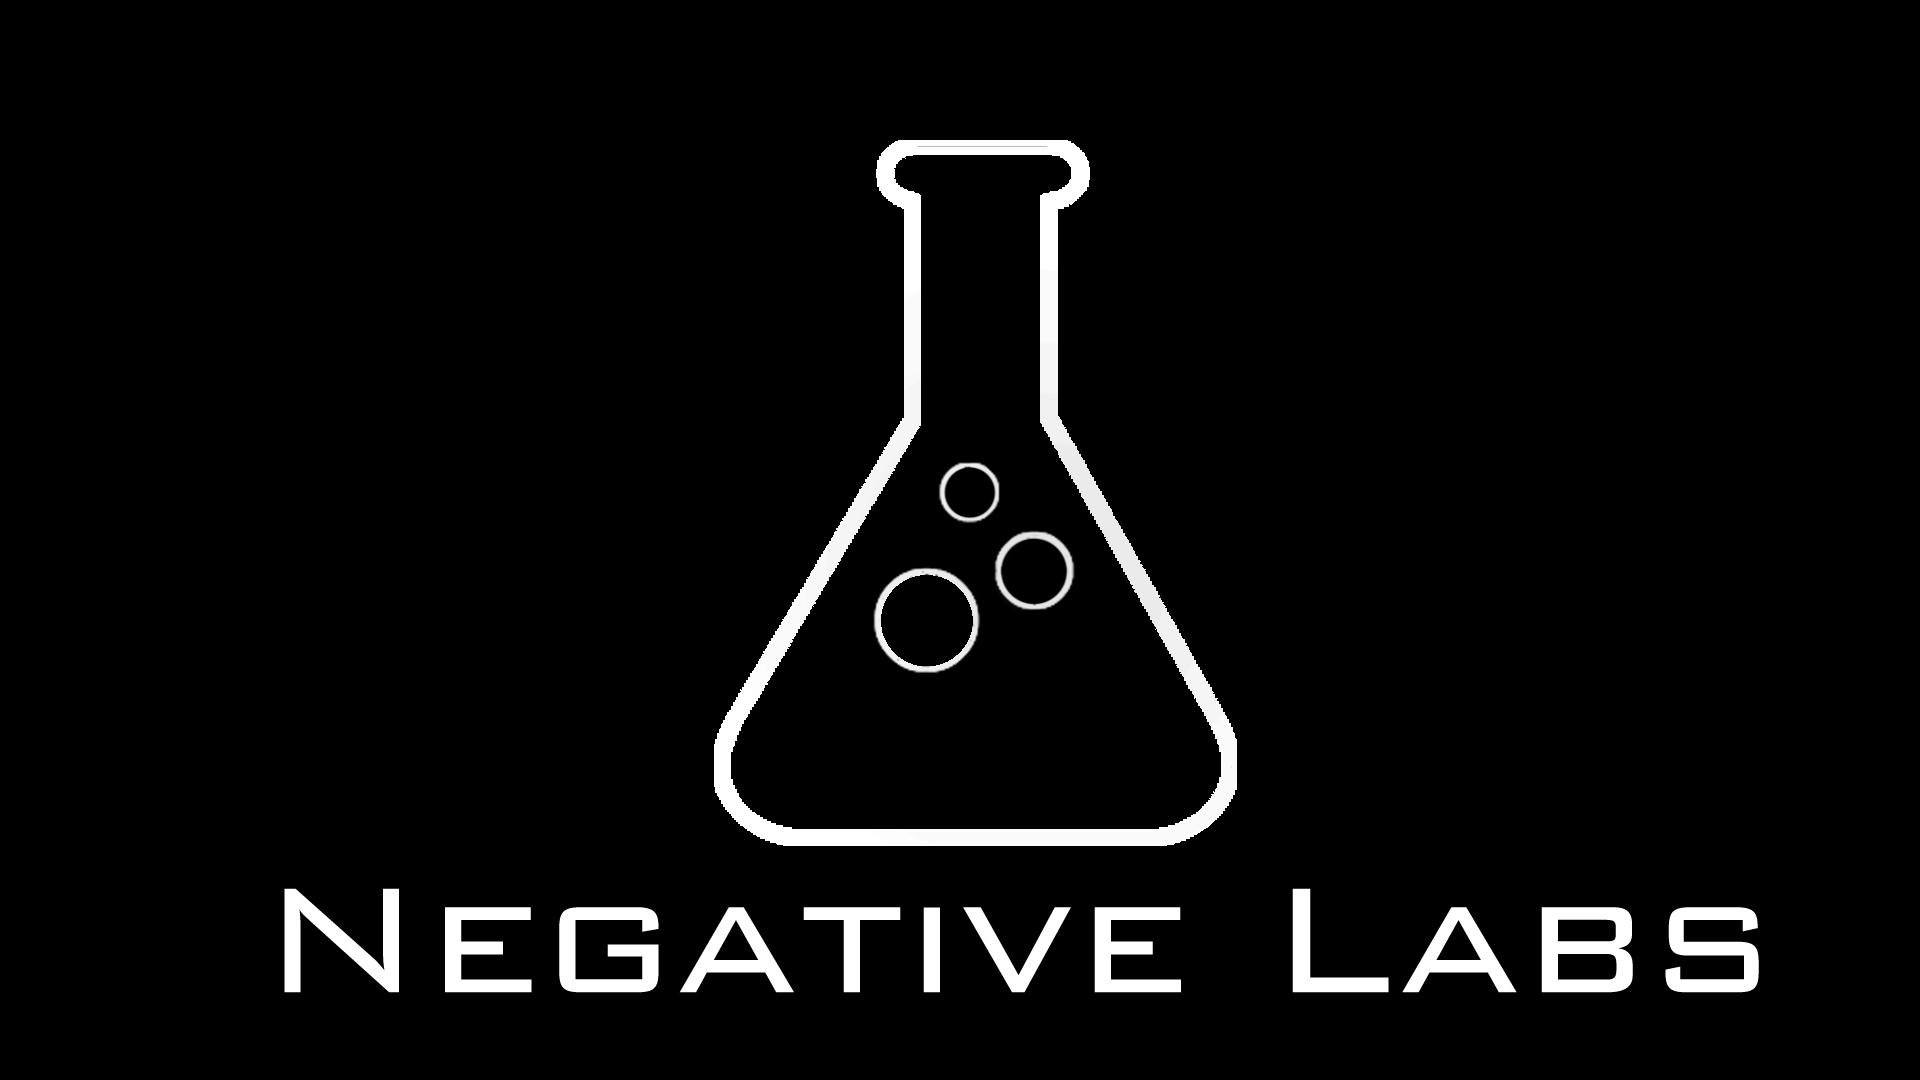 Negative_labs_black_wallpaper__copy